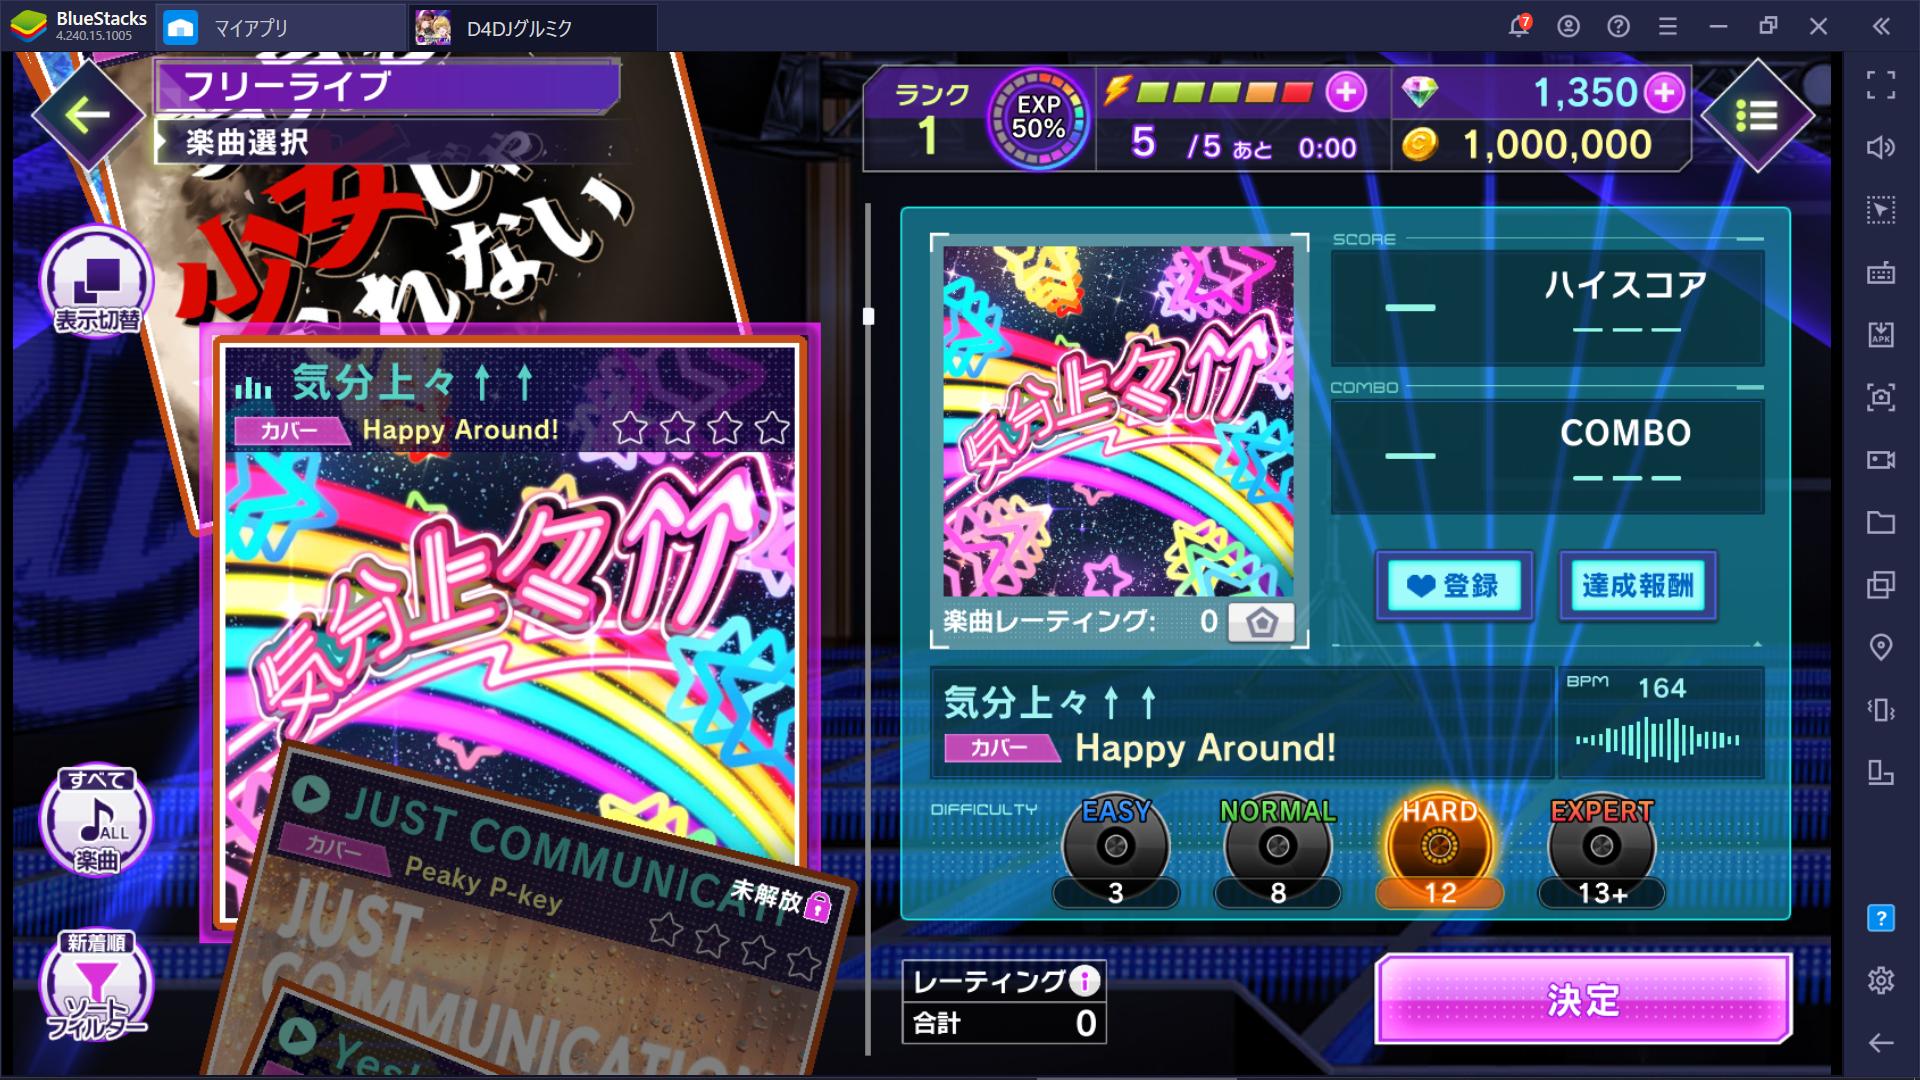 BlueStacksを使ってPCで『D4DJ Groovy Mix』を遊ぼう